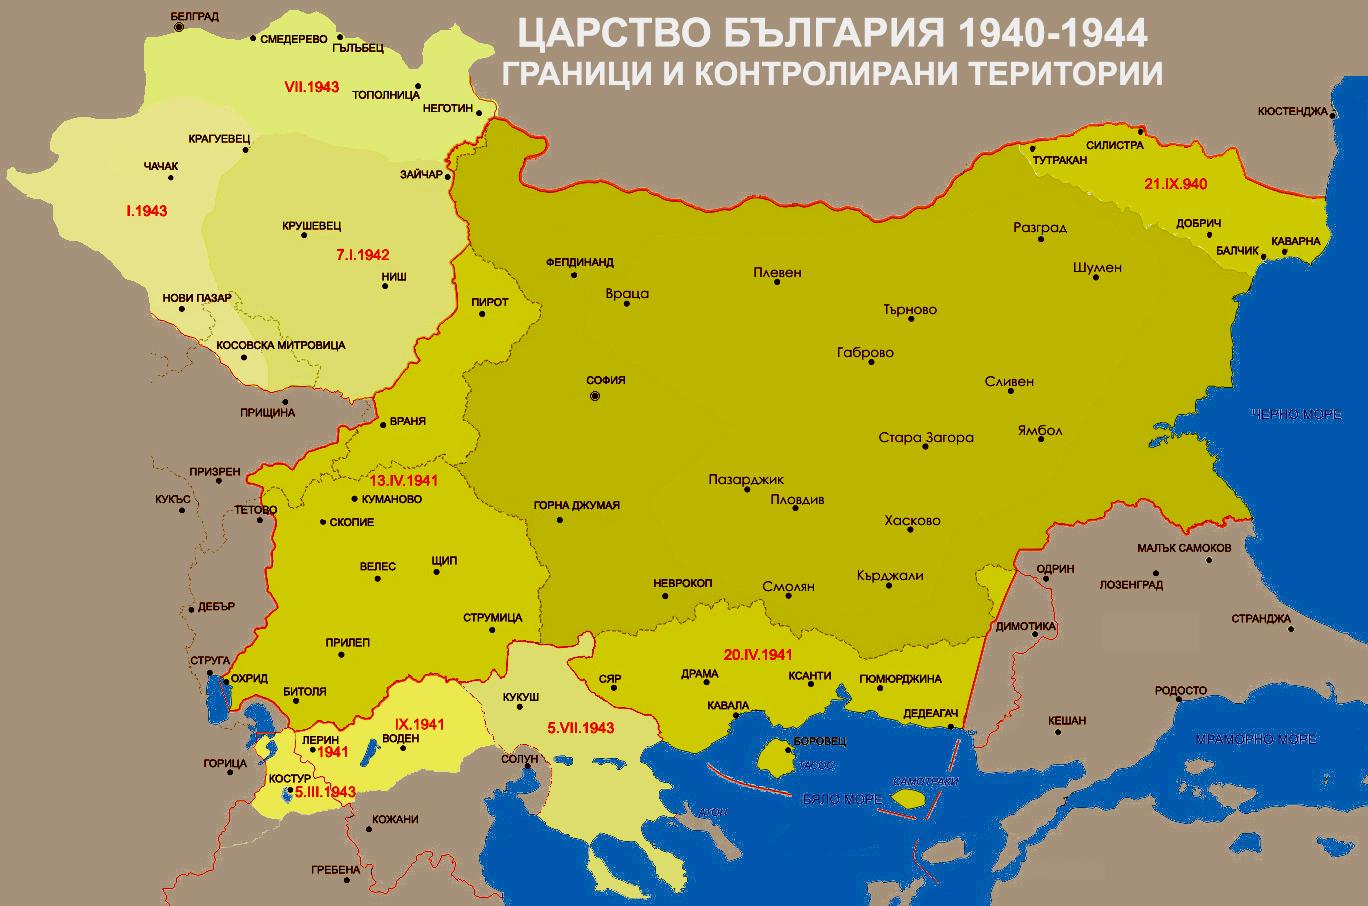 Bulgaria%201940-1944g_.jpg